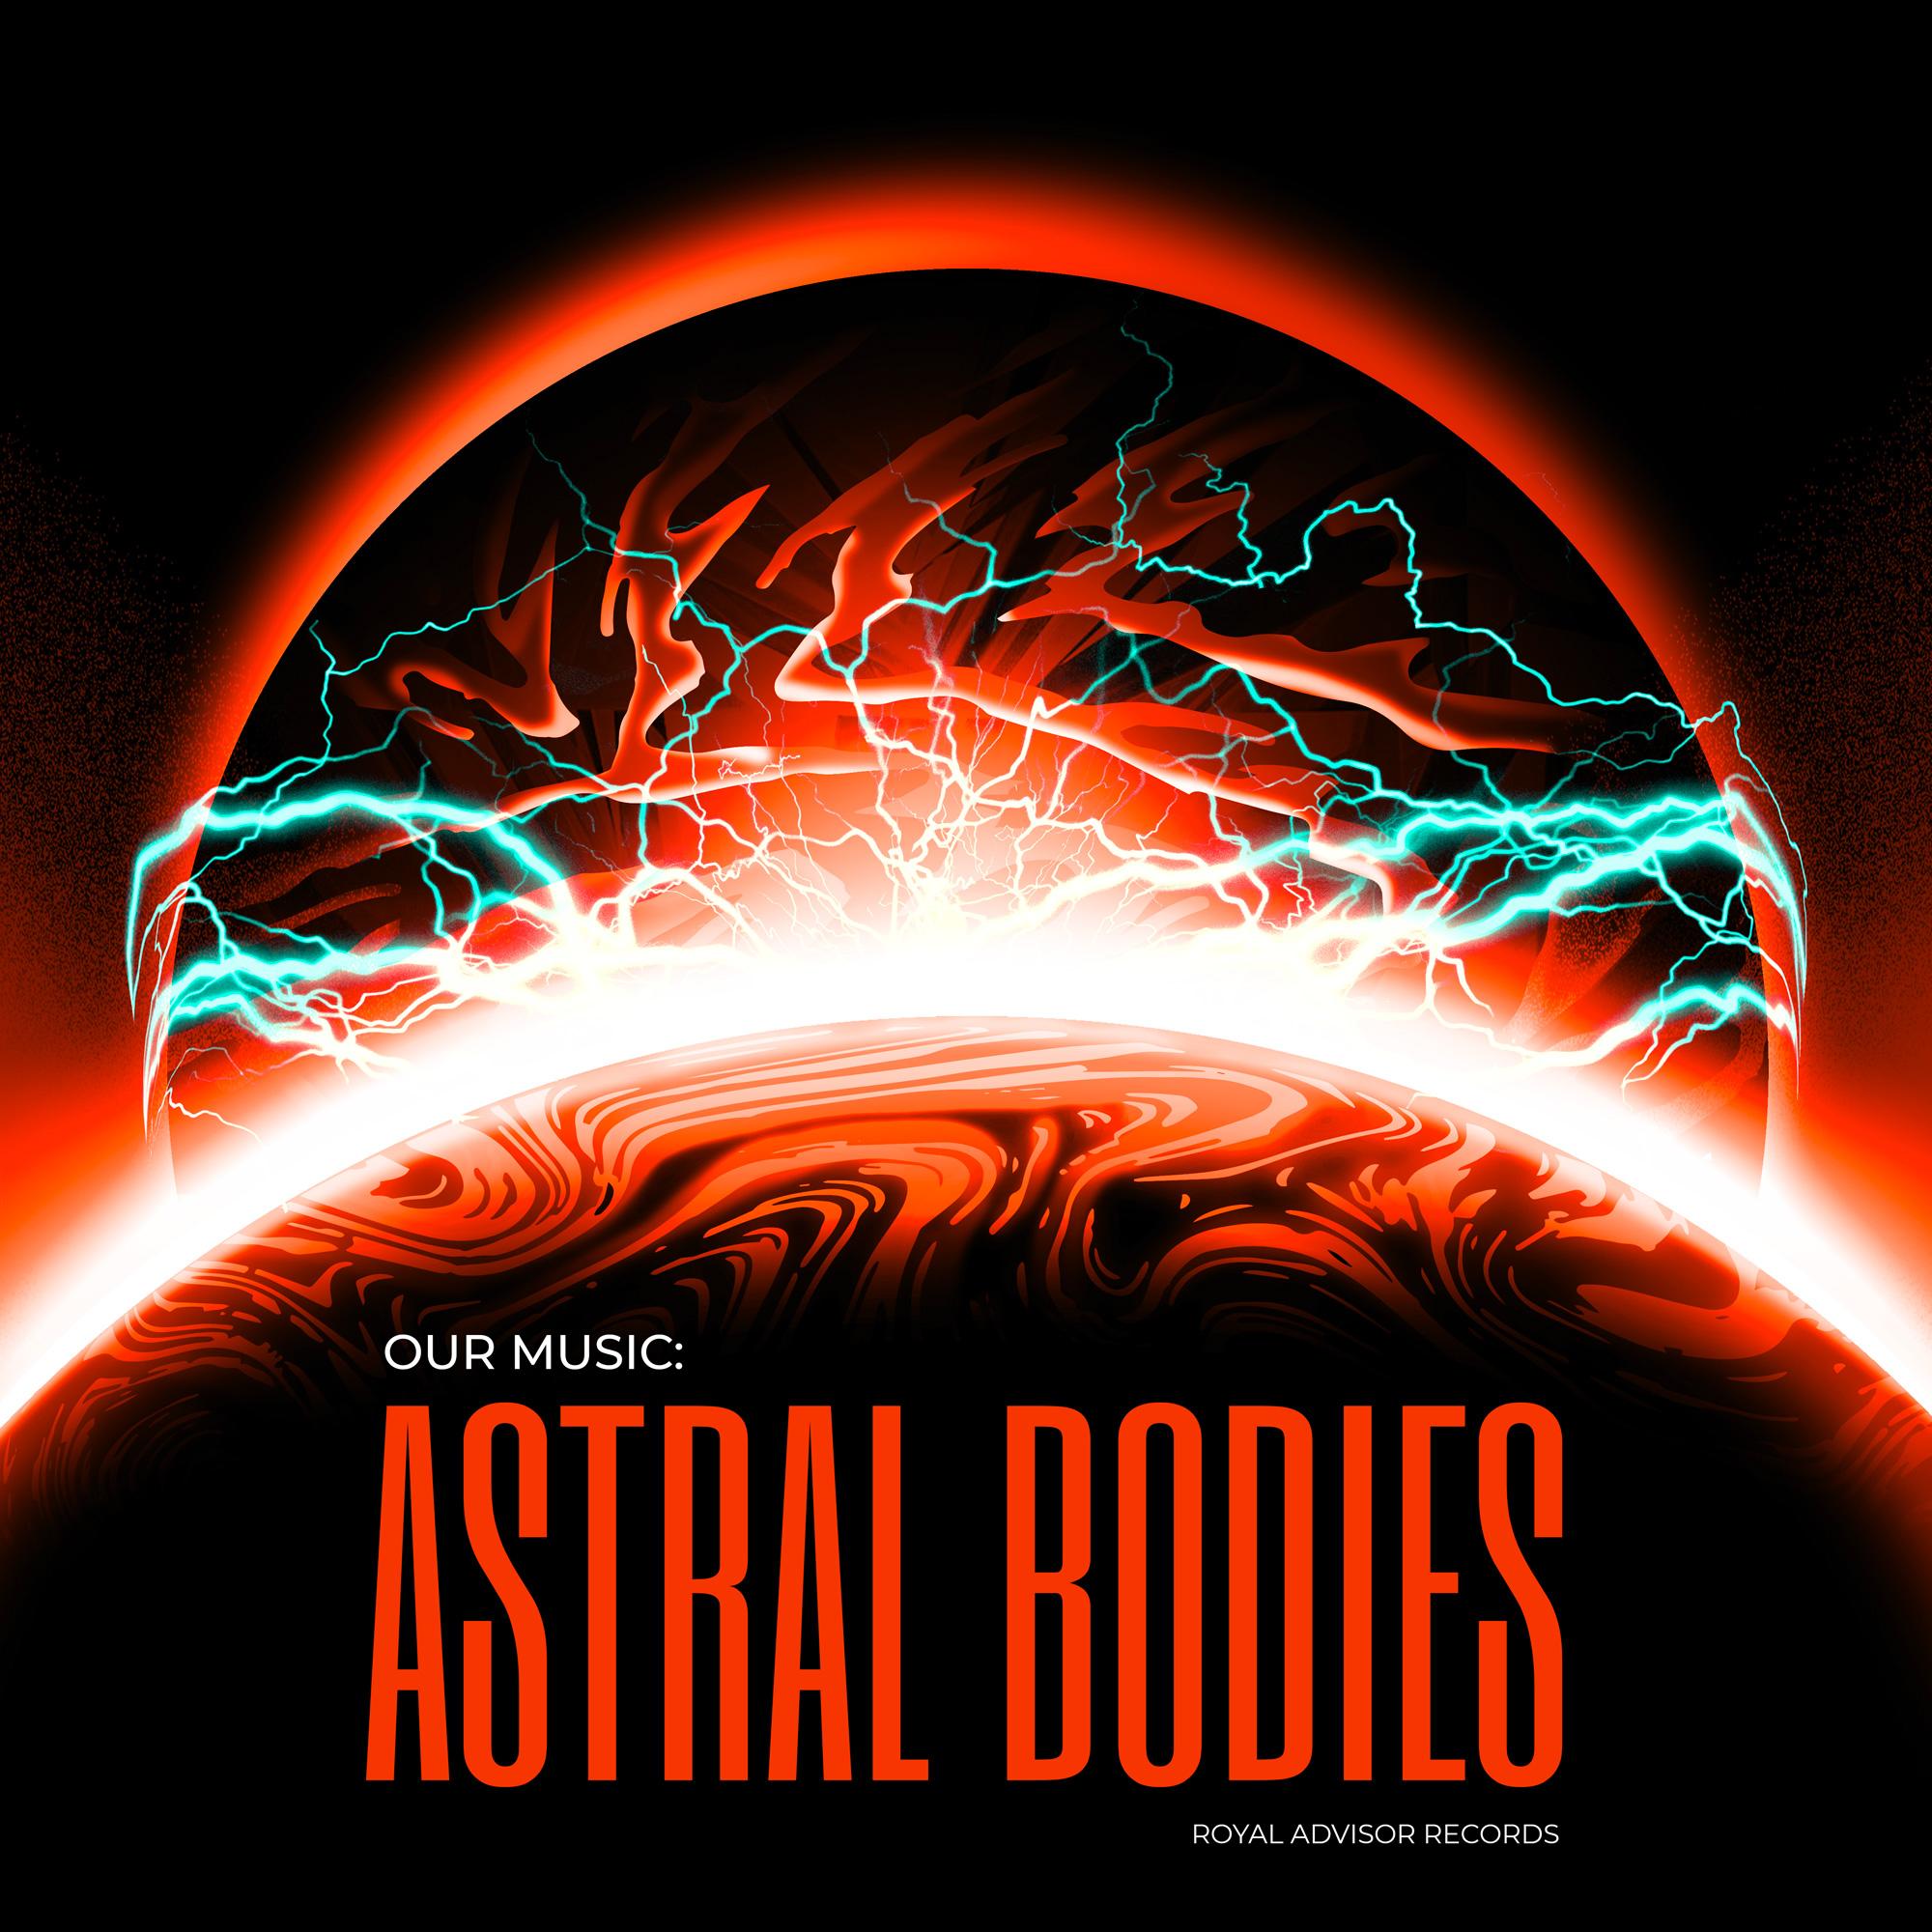 Astral-Bodies-final-2000x2000-high-quality-v2